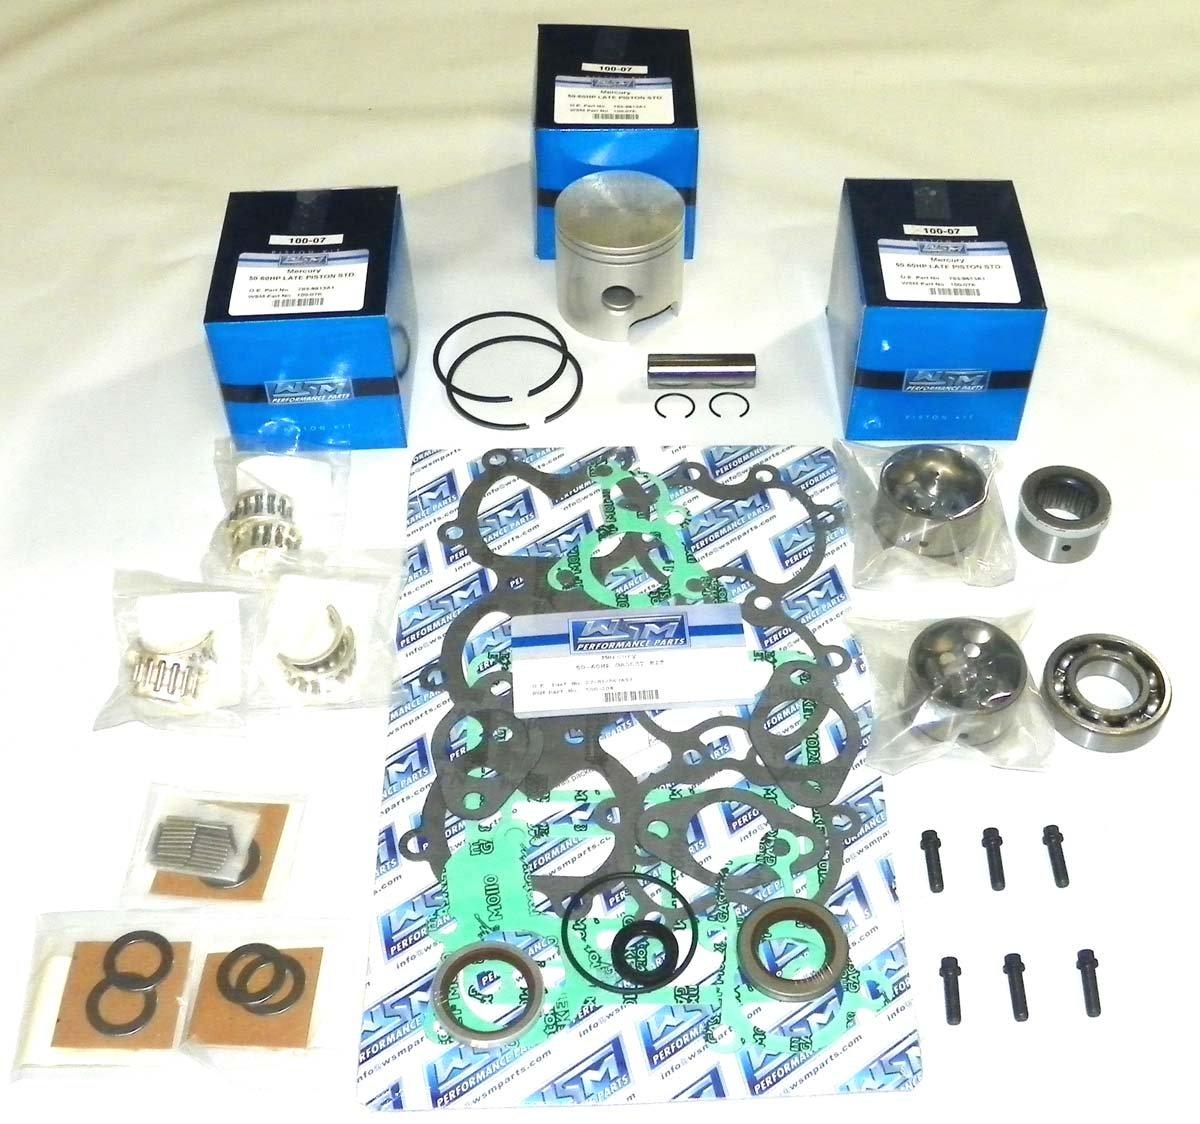 Mercury 50 & 60 Hp 1998-2005, 3 Cylinder Power Head Rebuild Kit PWC 100-06-10 STD Piston OEM# 705-850026A 1, 705-850026T 1 (.040'' (3.032''))